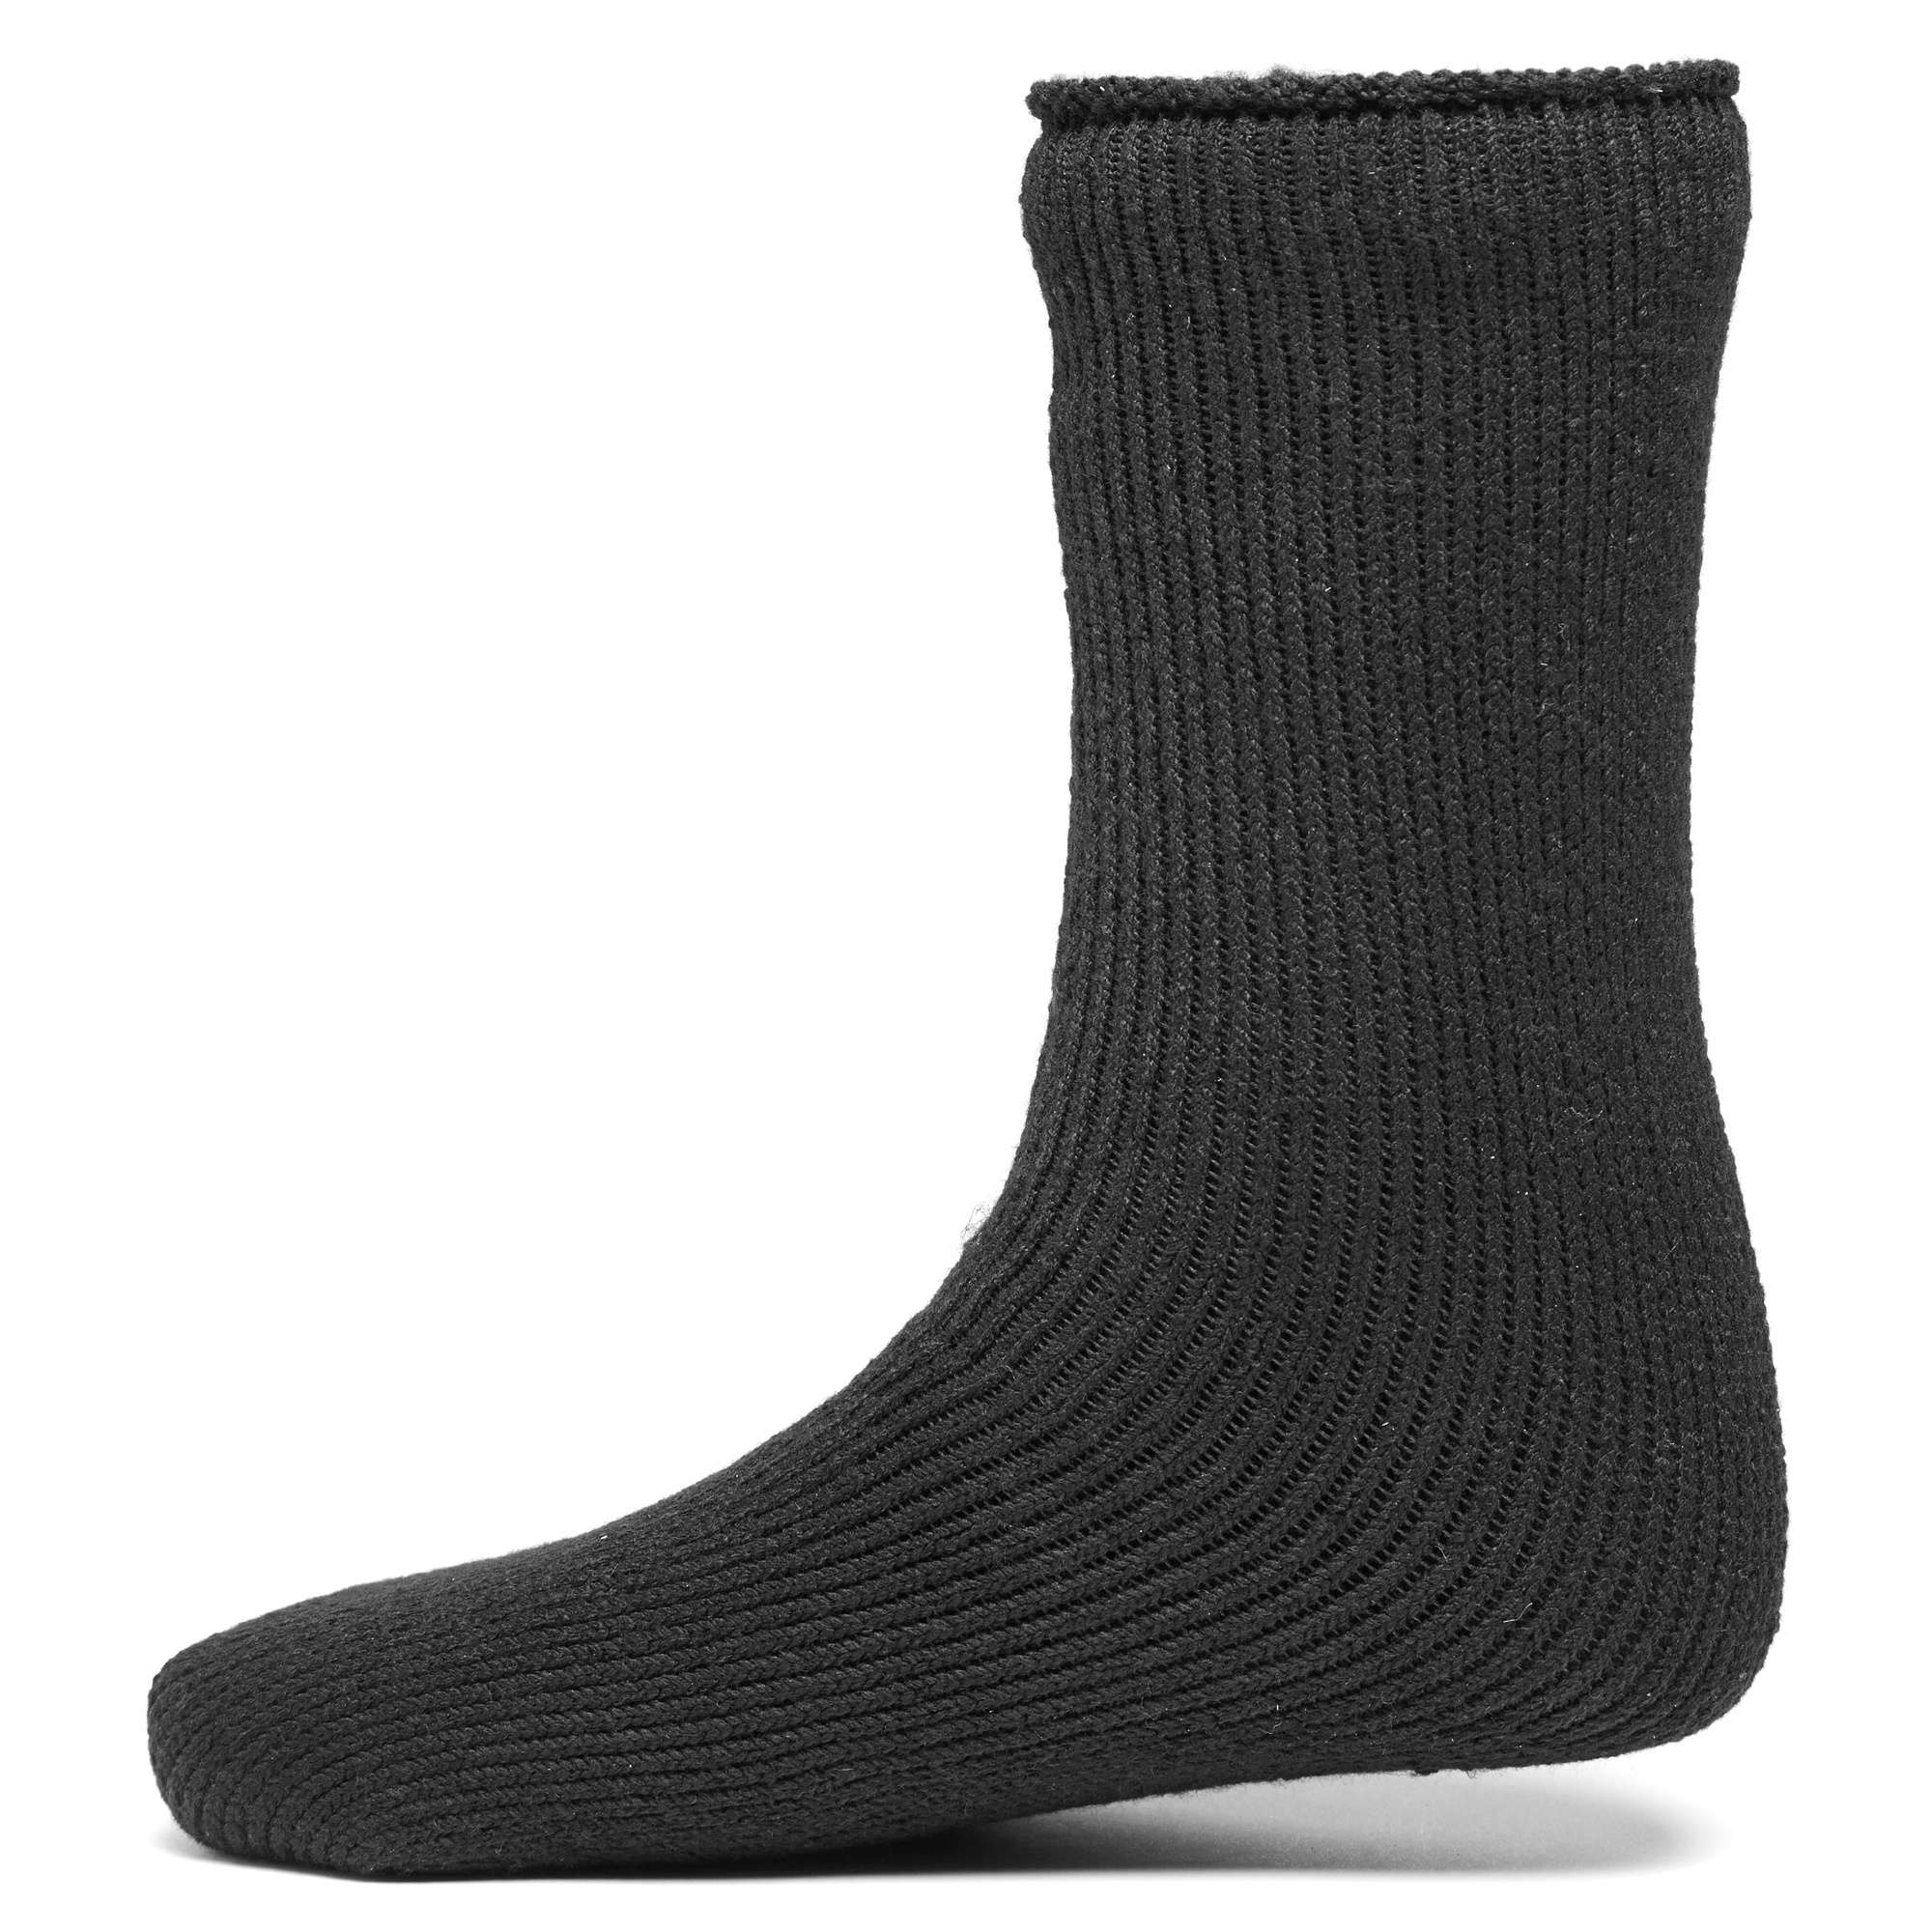 HEAT HOLDERS Kids' Original Thermal Socks